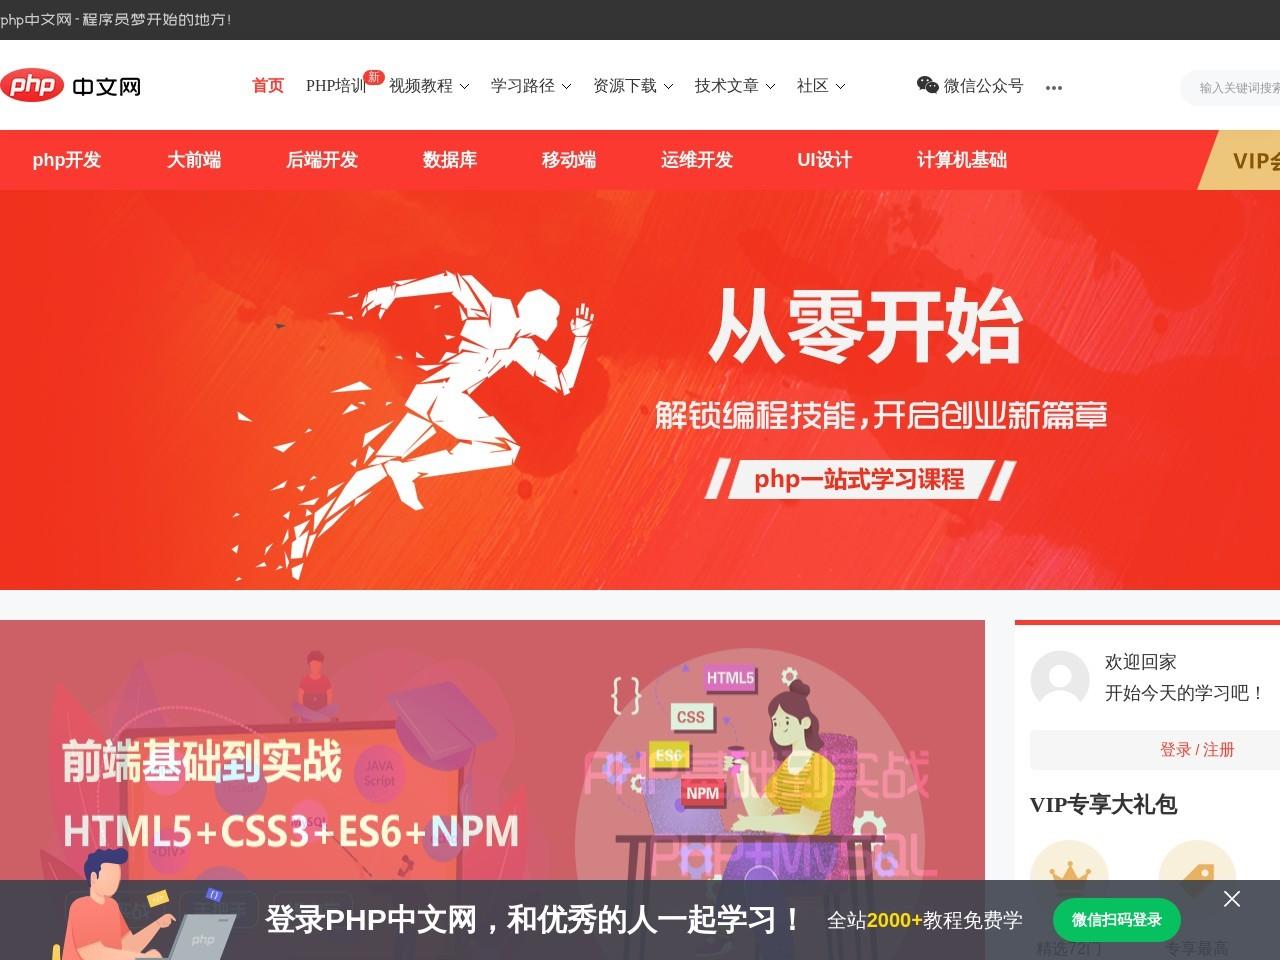 php中文网_免费php在线学习平台